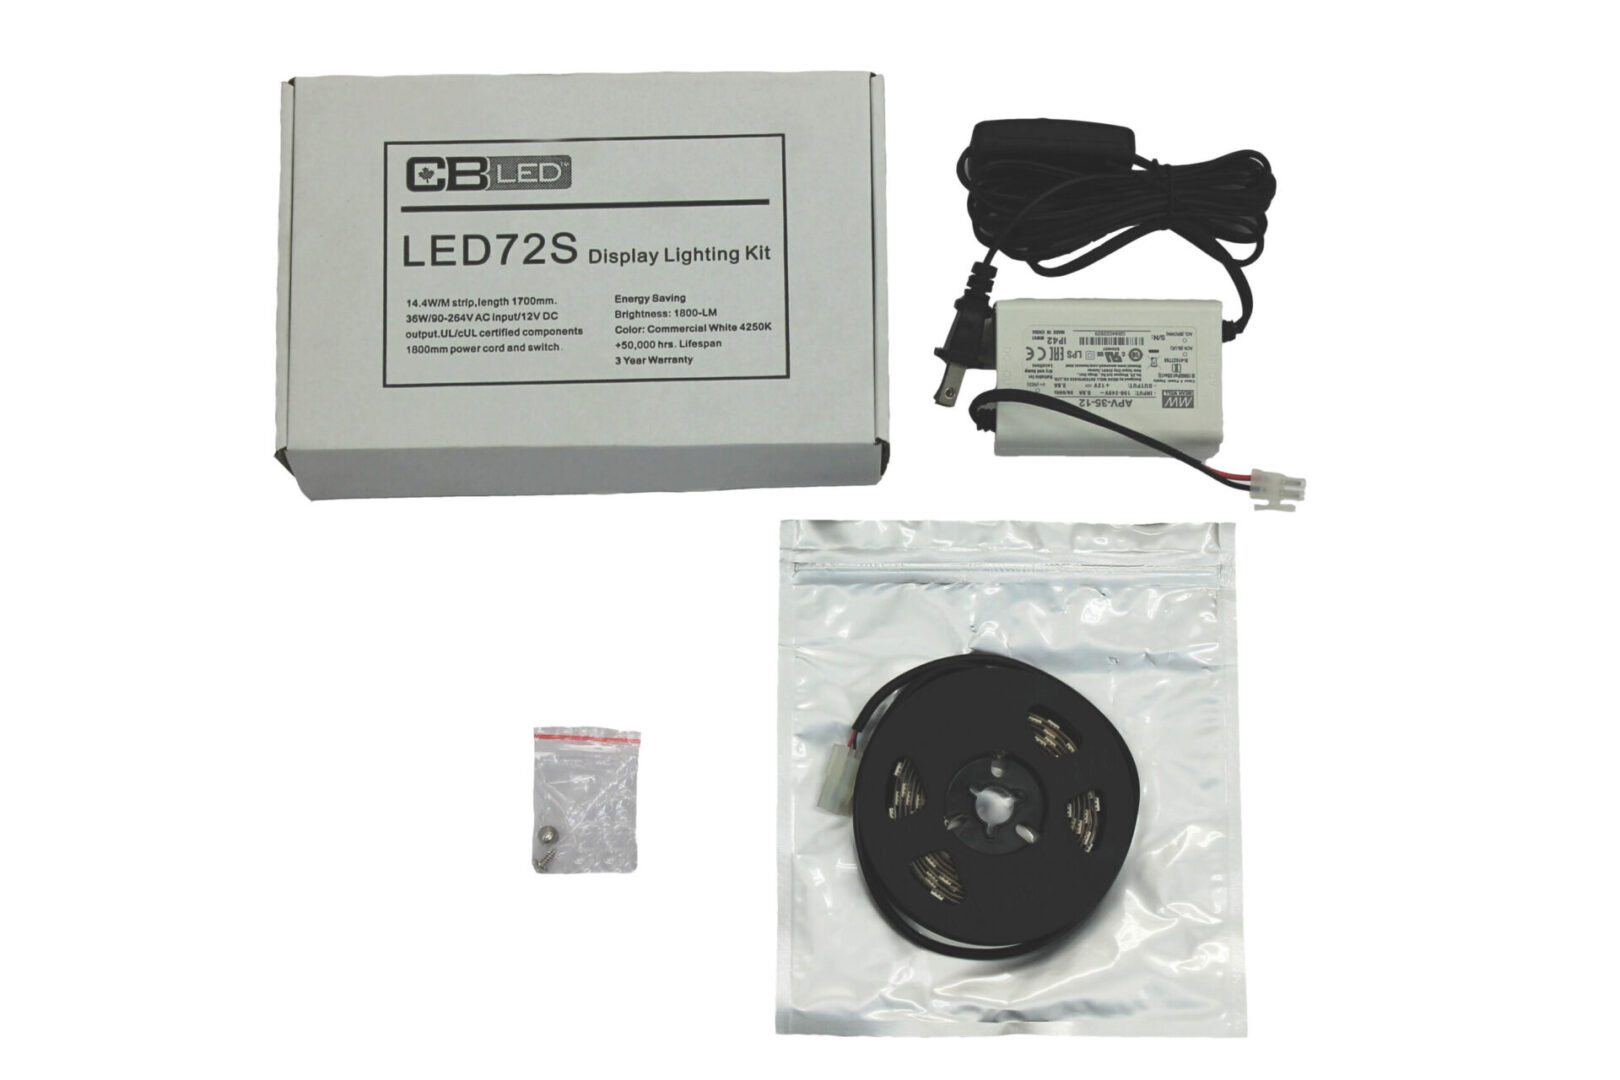 LED72S Display Lighting Kit